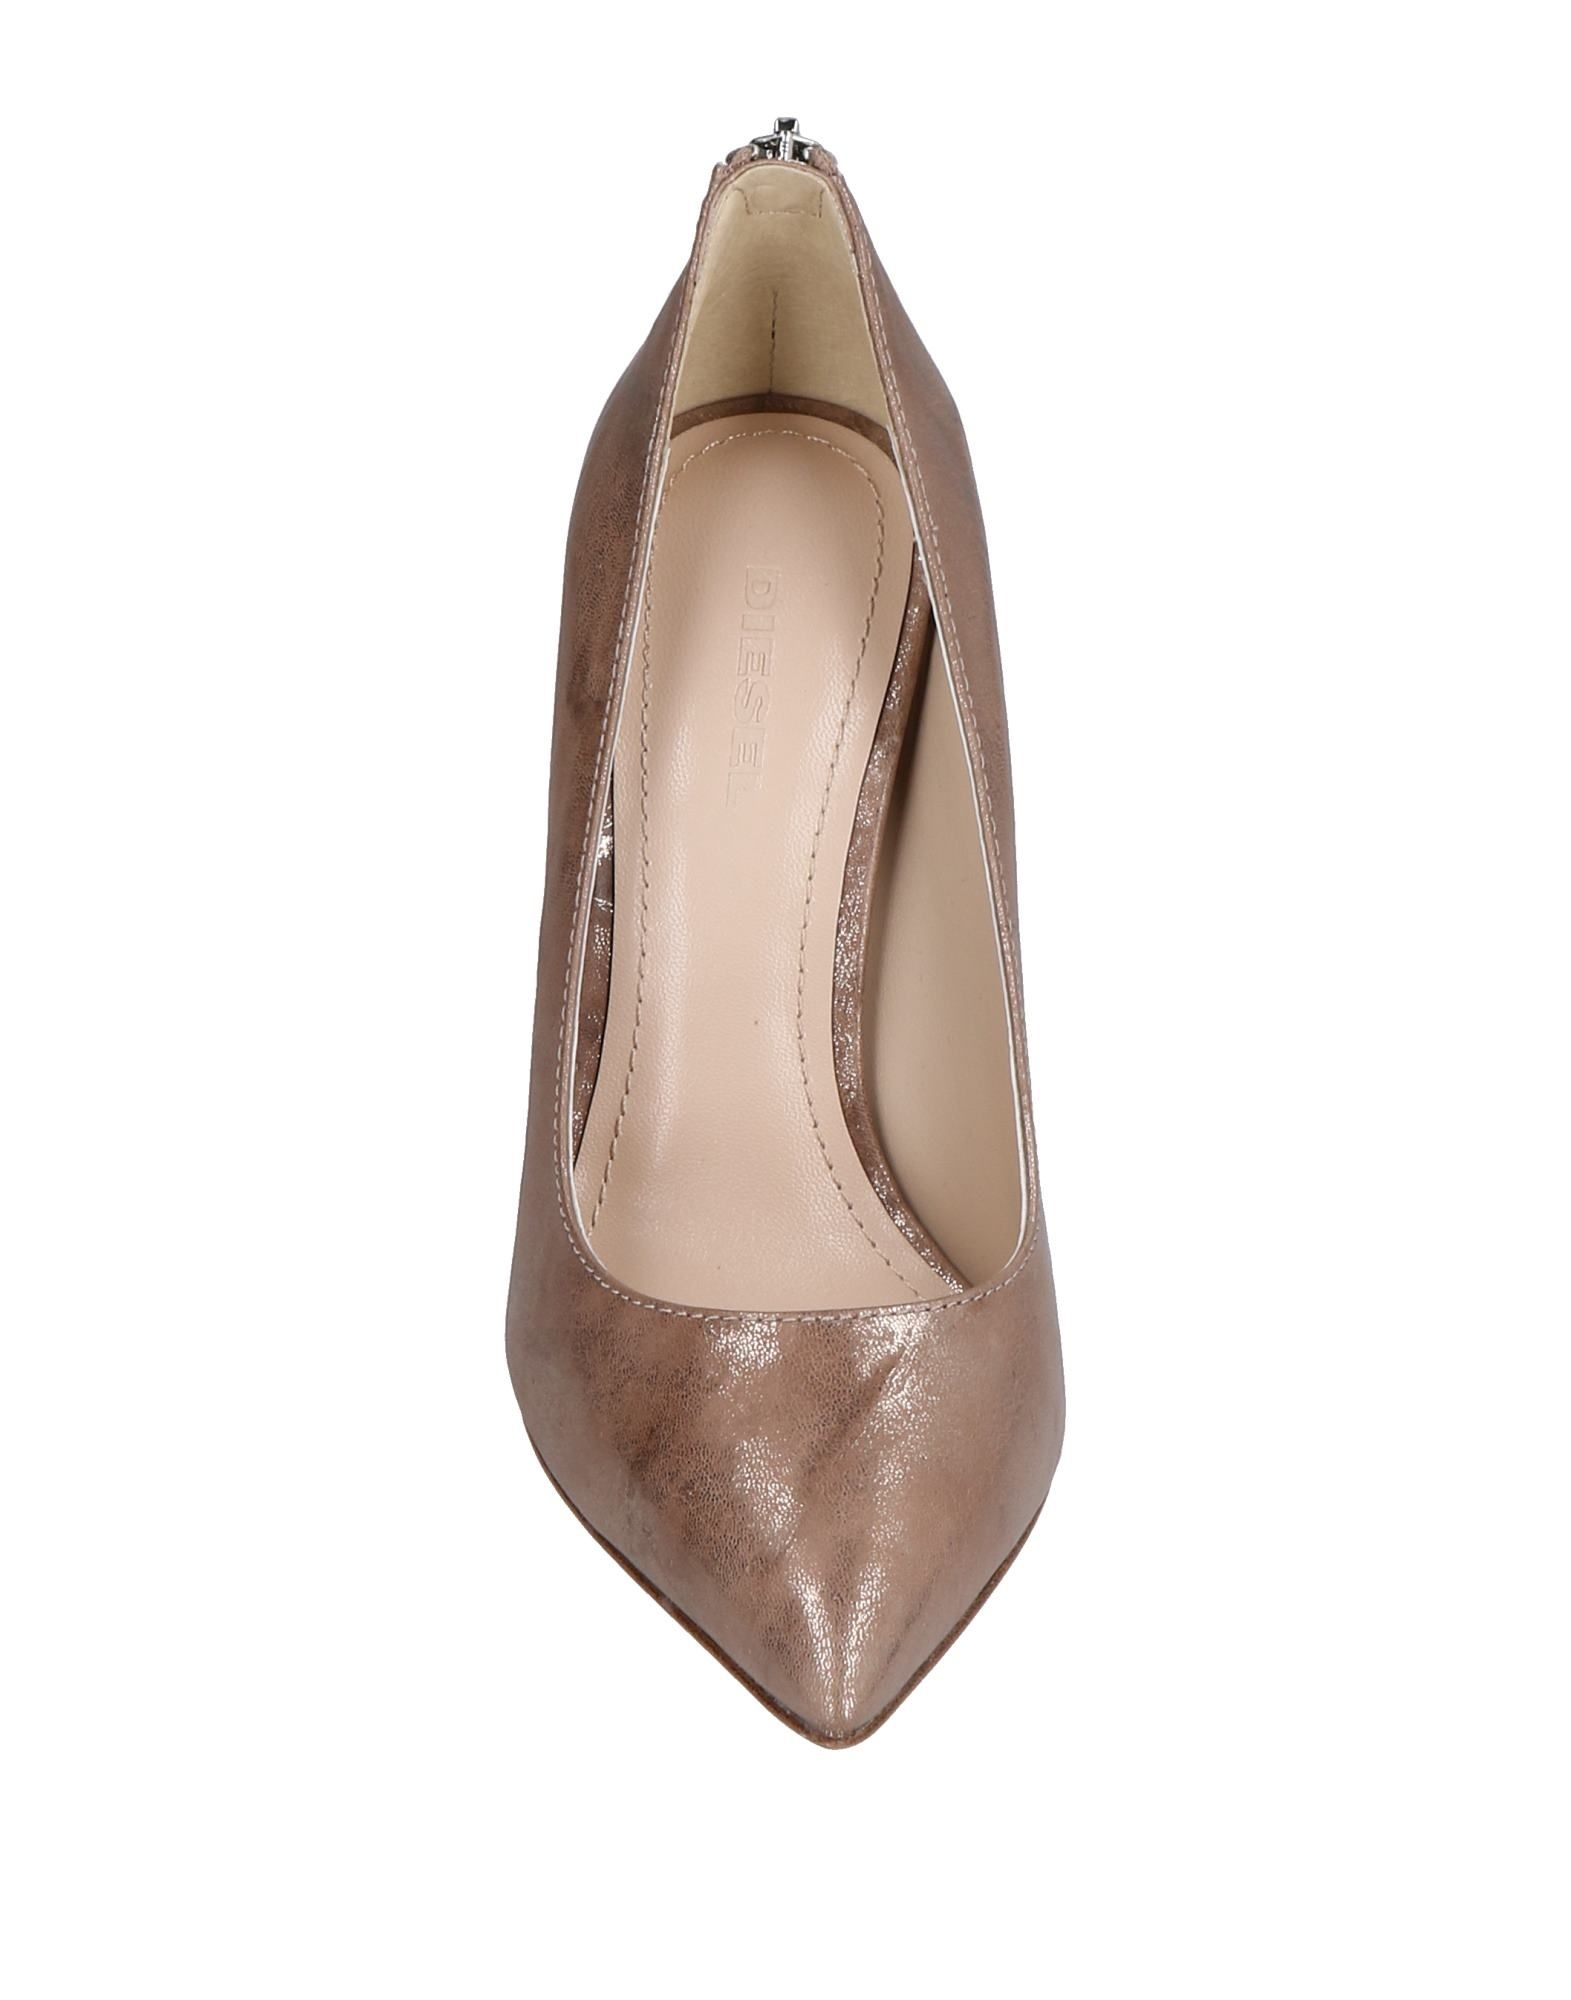 Stilvolle billige Schuhe Damen Diesel Pumps Damen Schuhe  11484747IT 9de10c